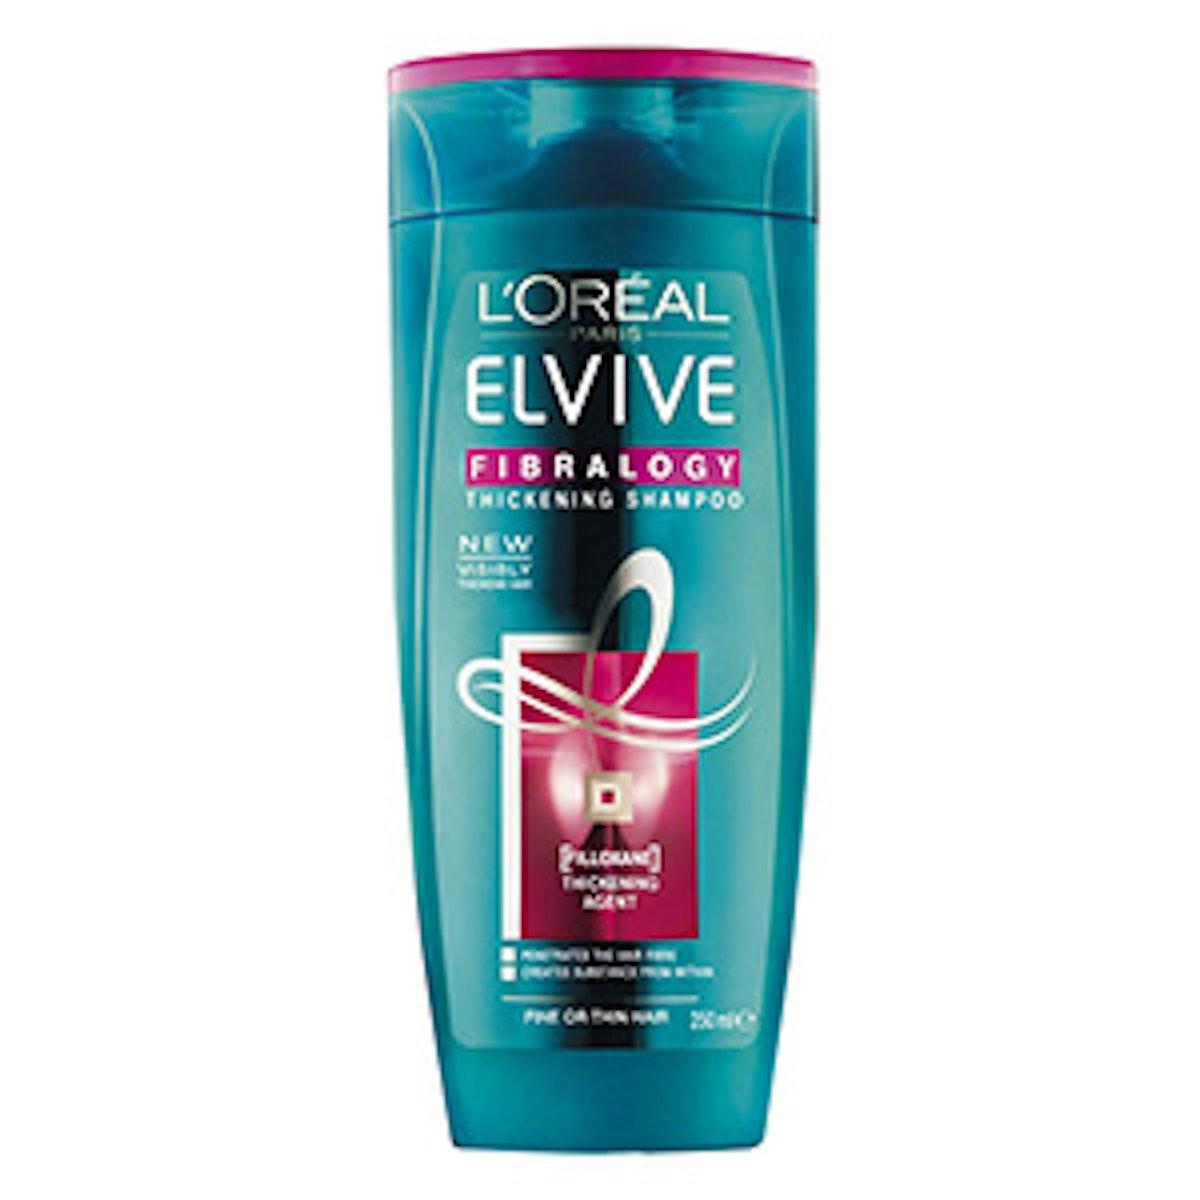 L'Oreal Paris Elvive Fibralogy Thickening Shampoo